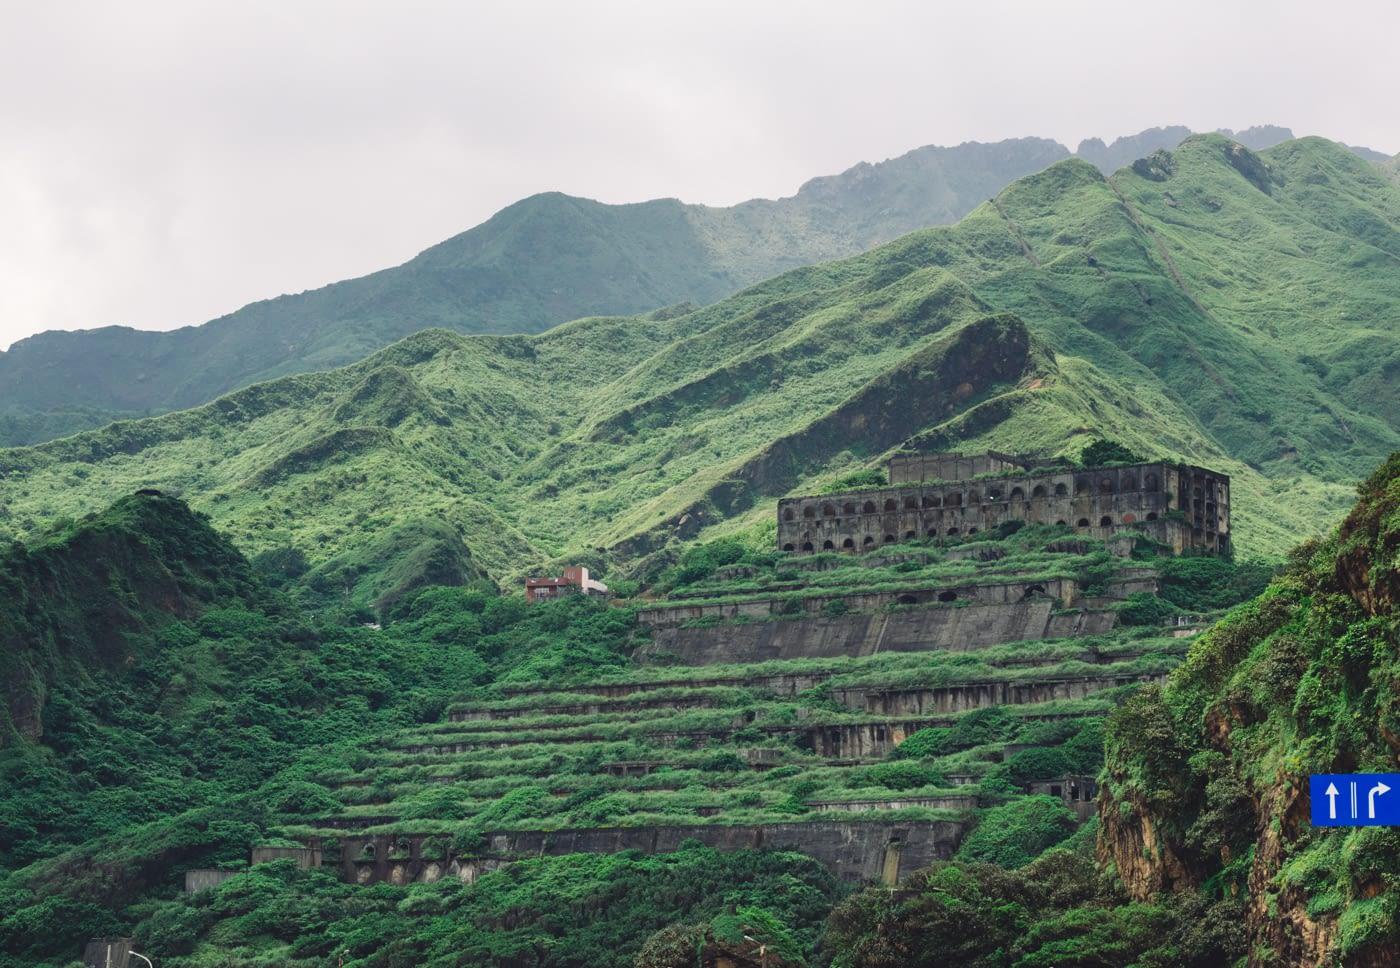 Taiwan - New Taipei City - Abandoned building amidst greenery mountain